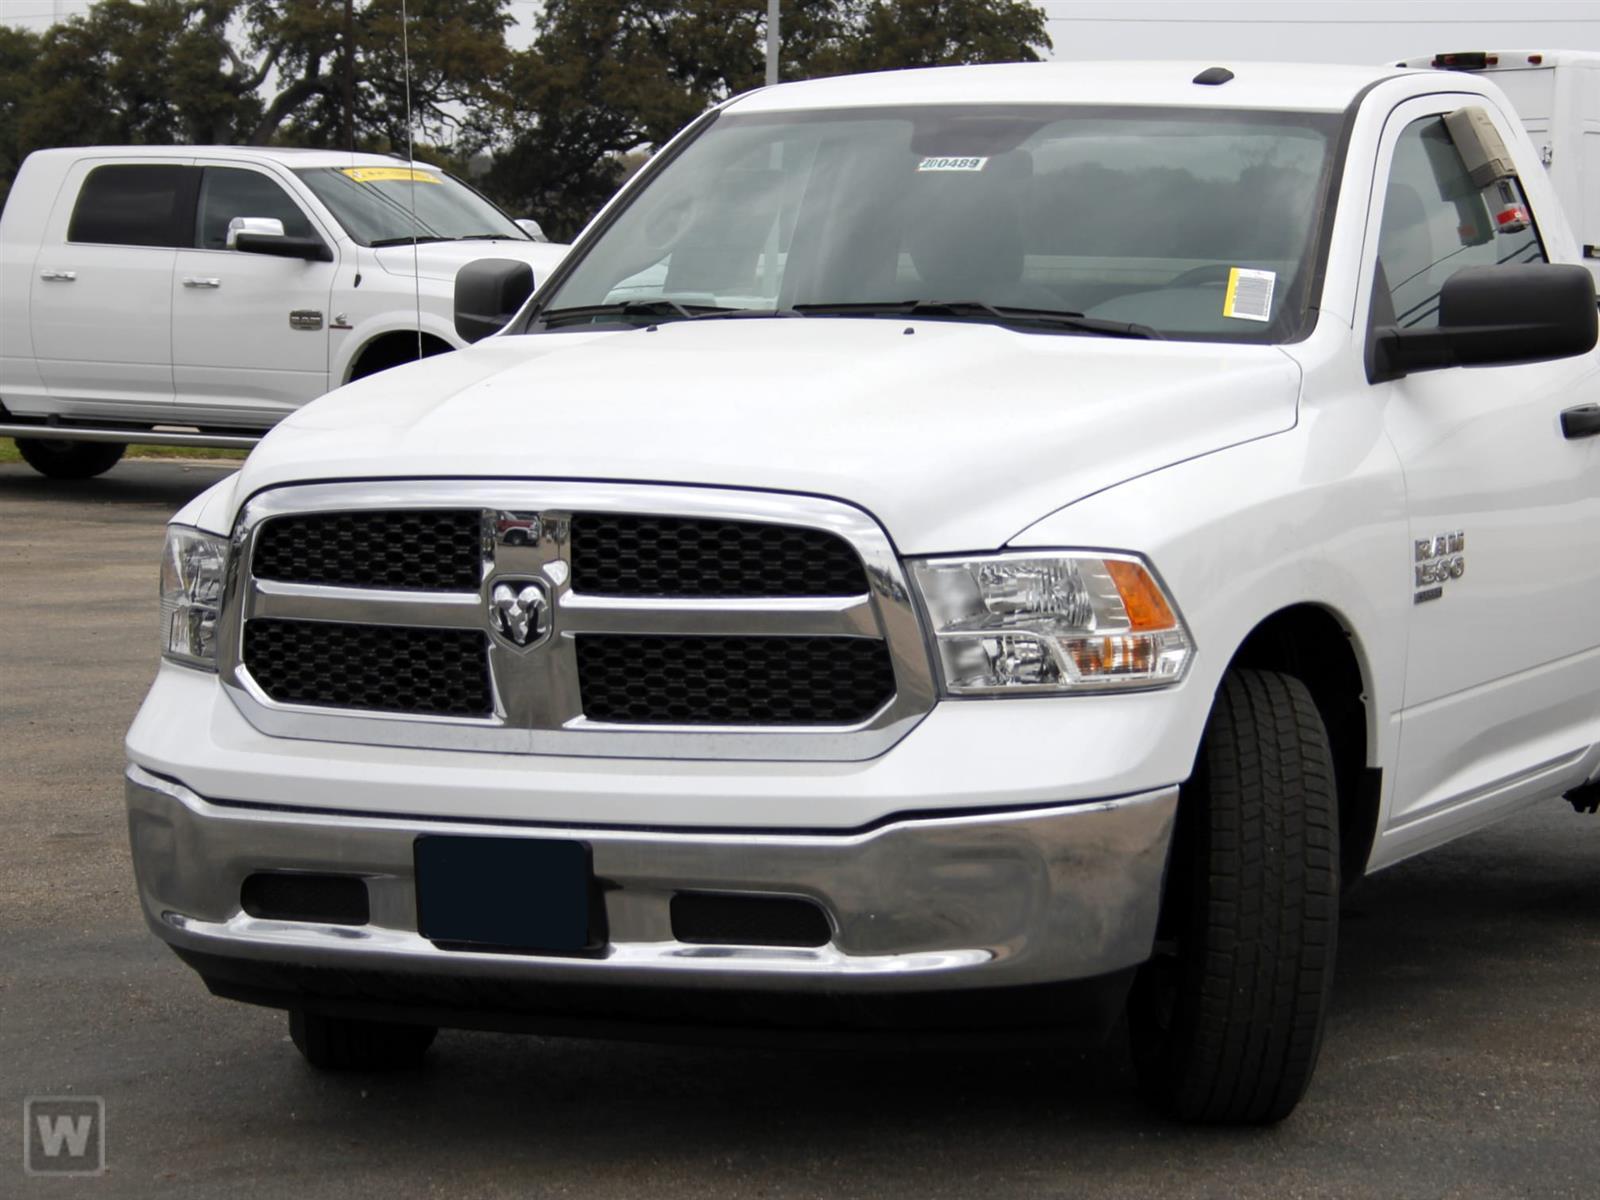 2020 Ram 1500 Regular Cab 4x2, Pickup #M201130 - photo 1